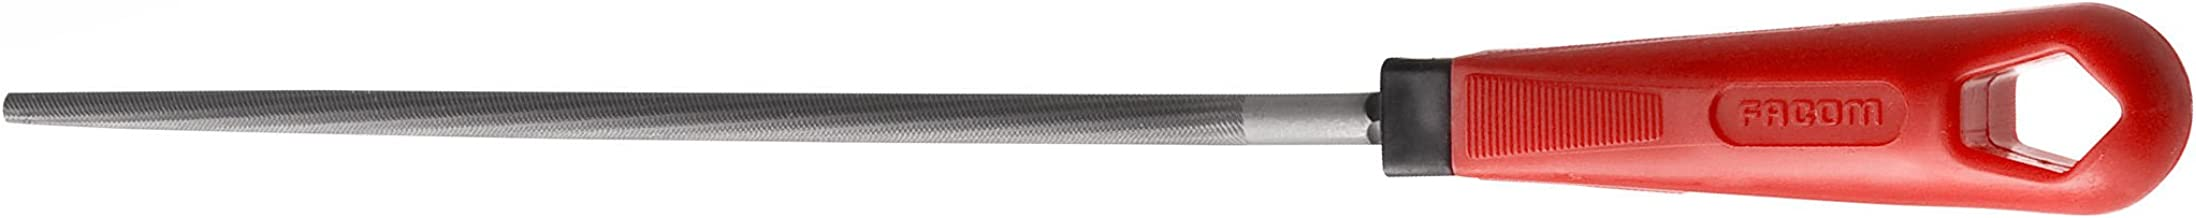 FACOM RD.MD150EMA serie RD.Mdema tweede gesneden ronde vijl met handvat, 150 mm lengte